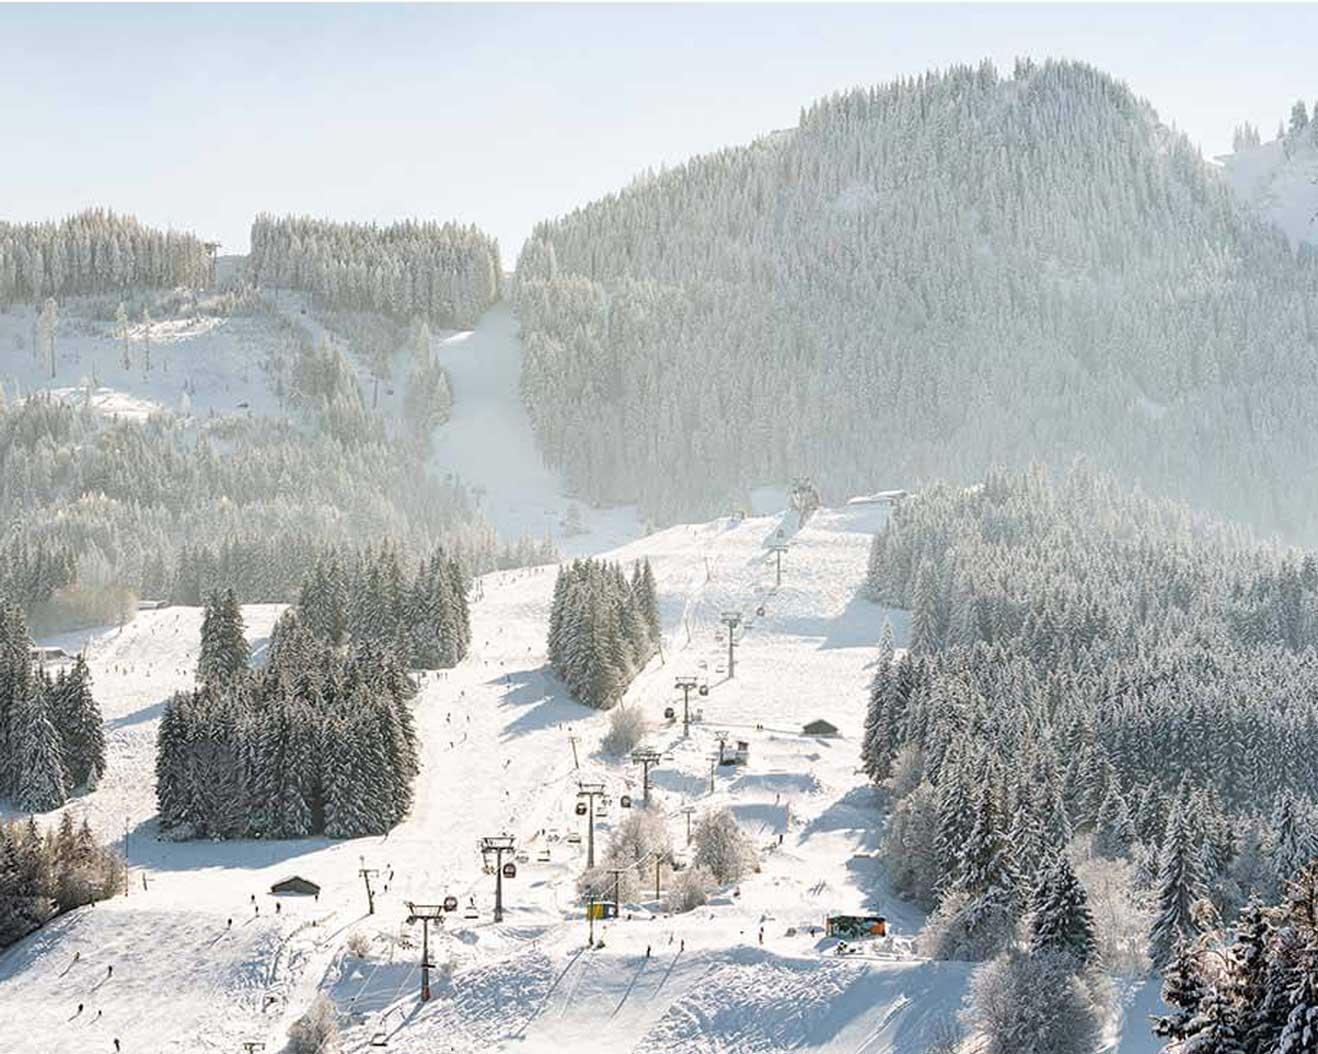 Alpspitzbahn - Nesselwang